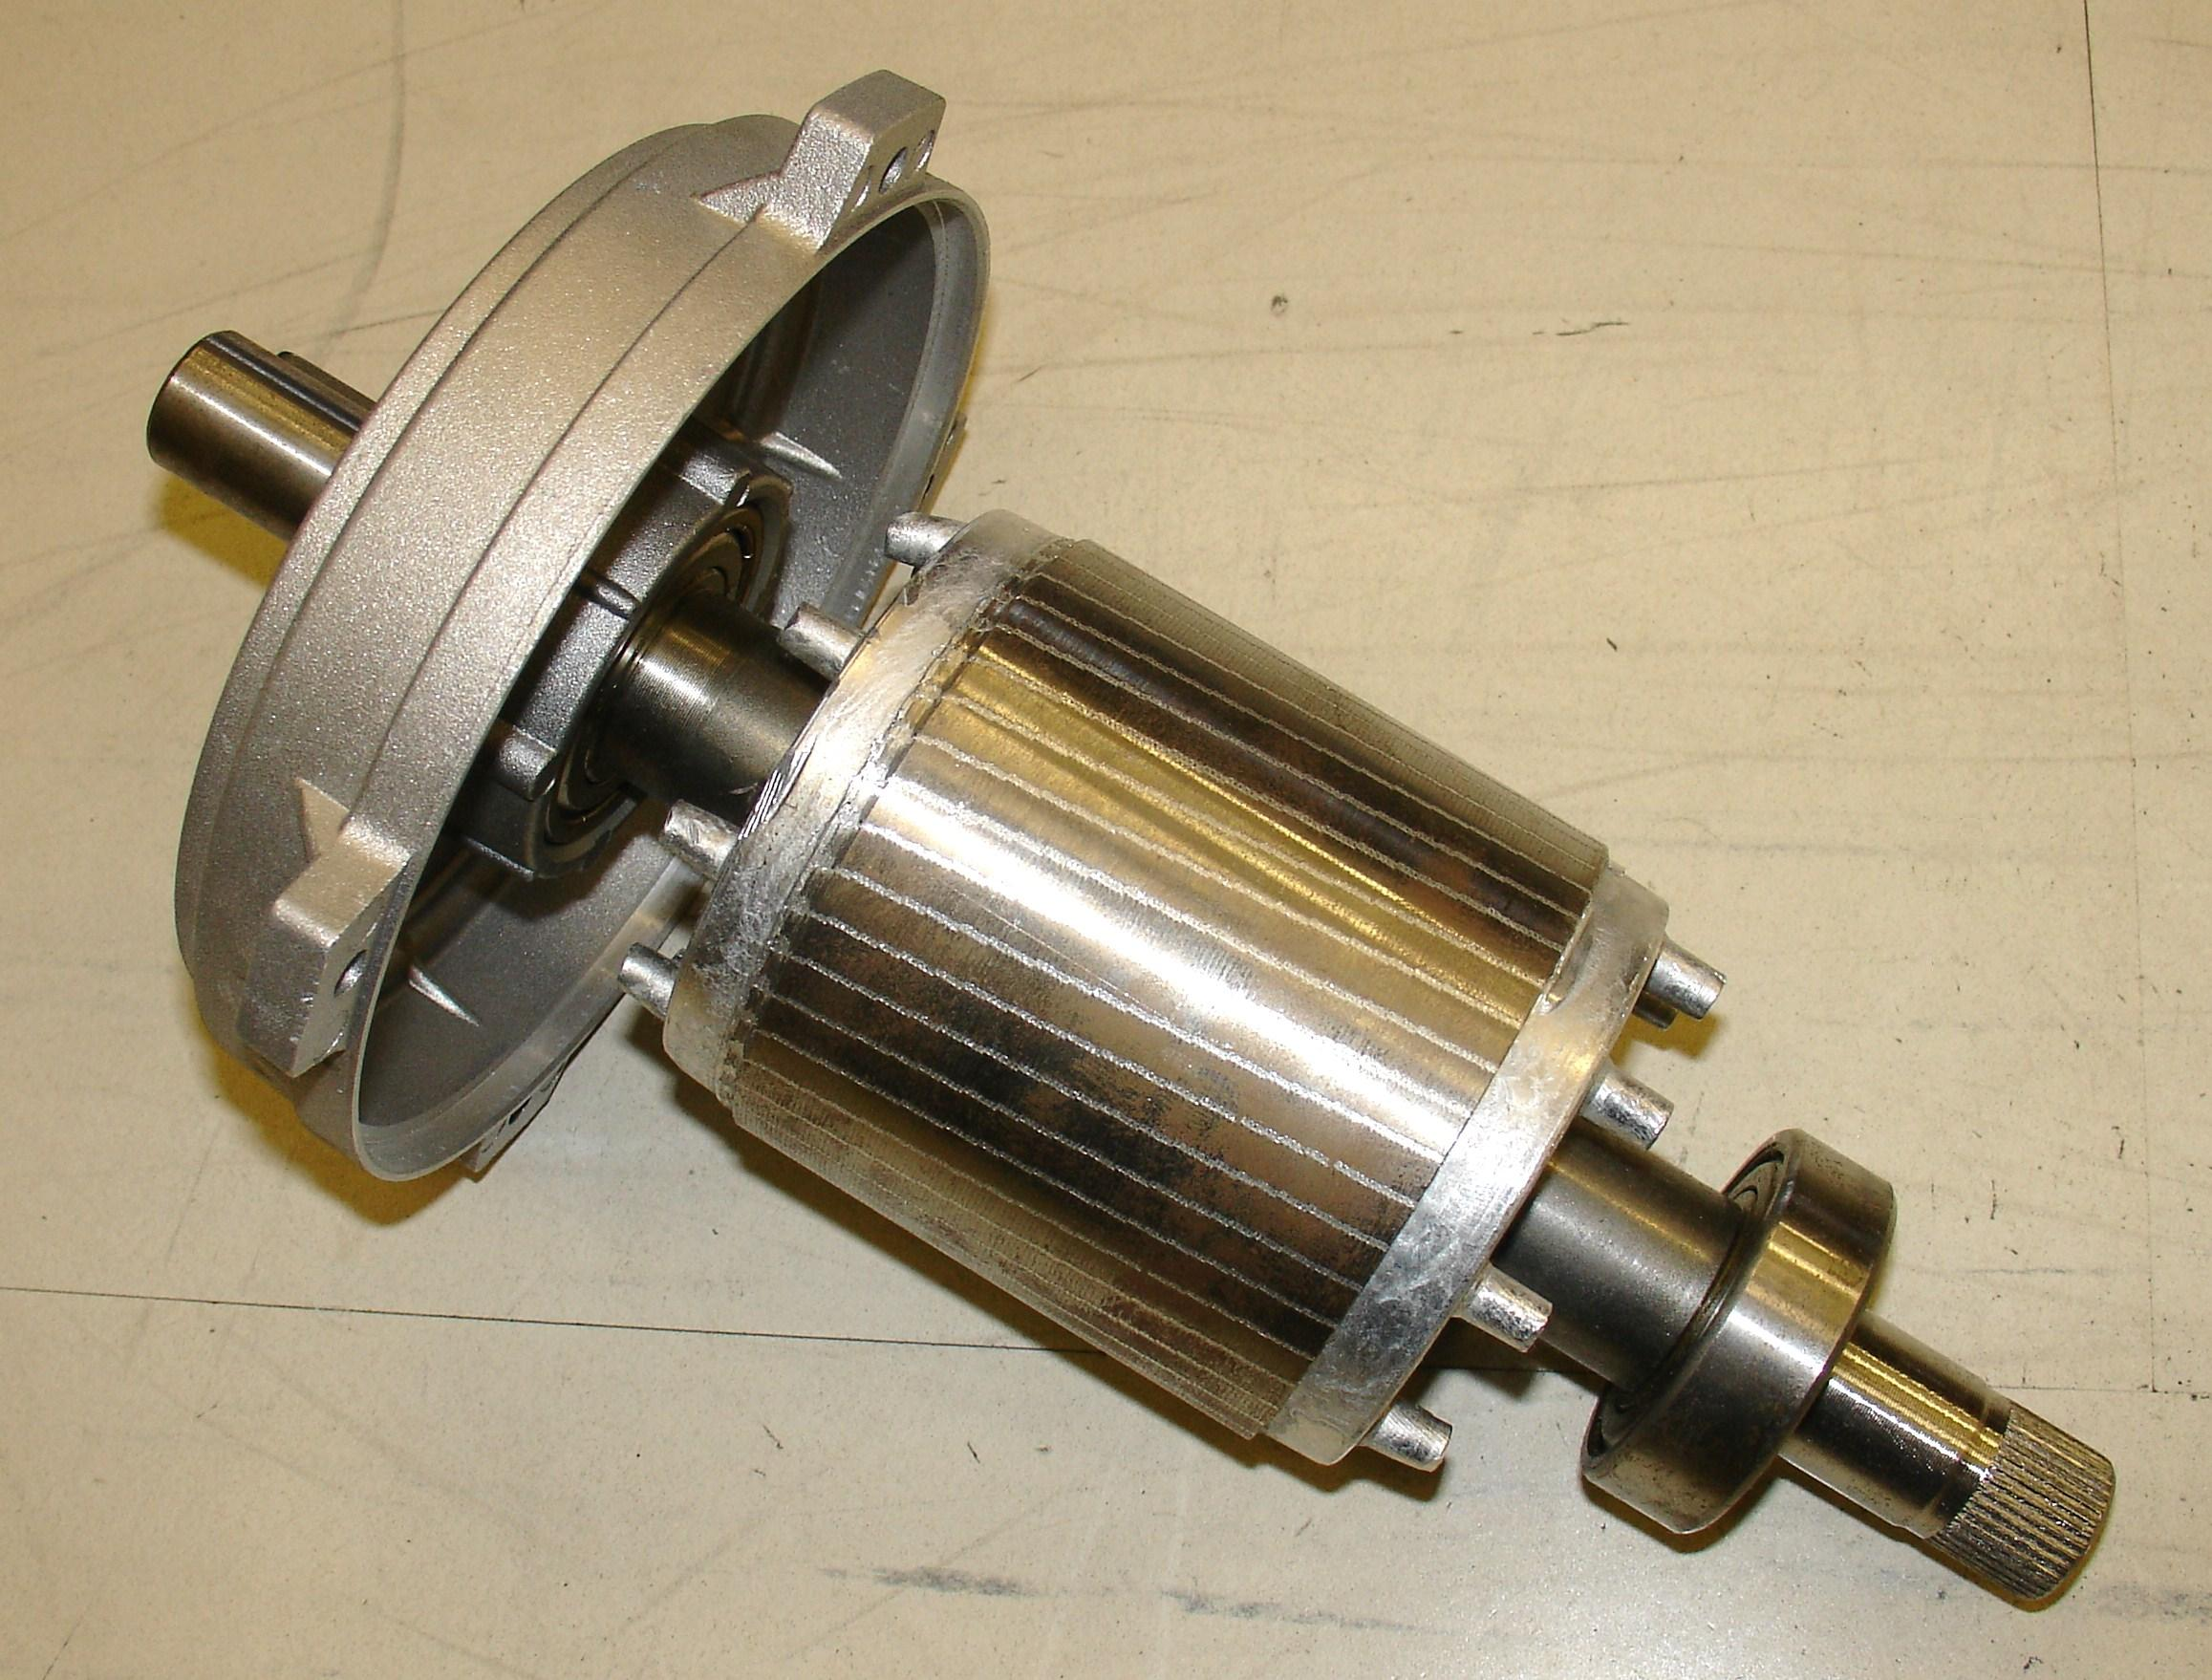 Squirrel-cage rotor - Wikipedia